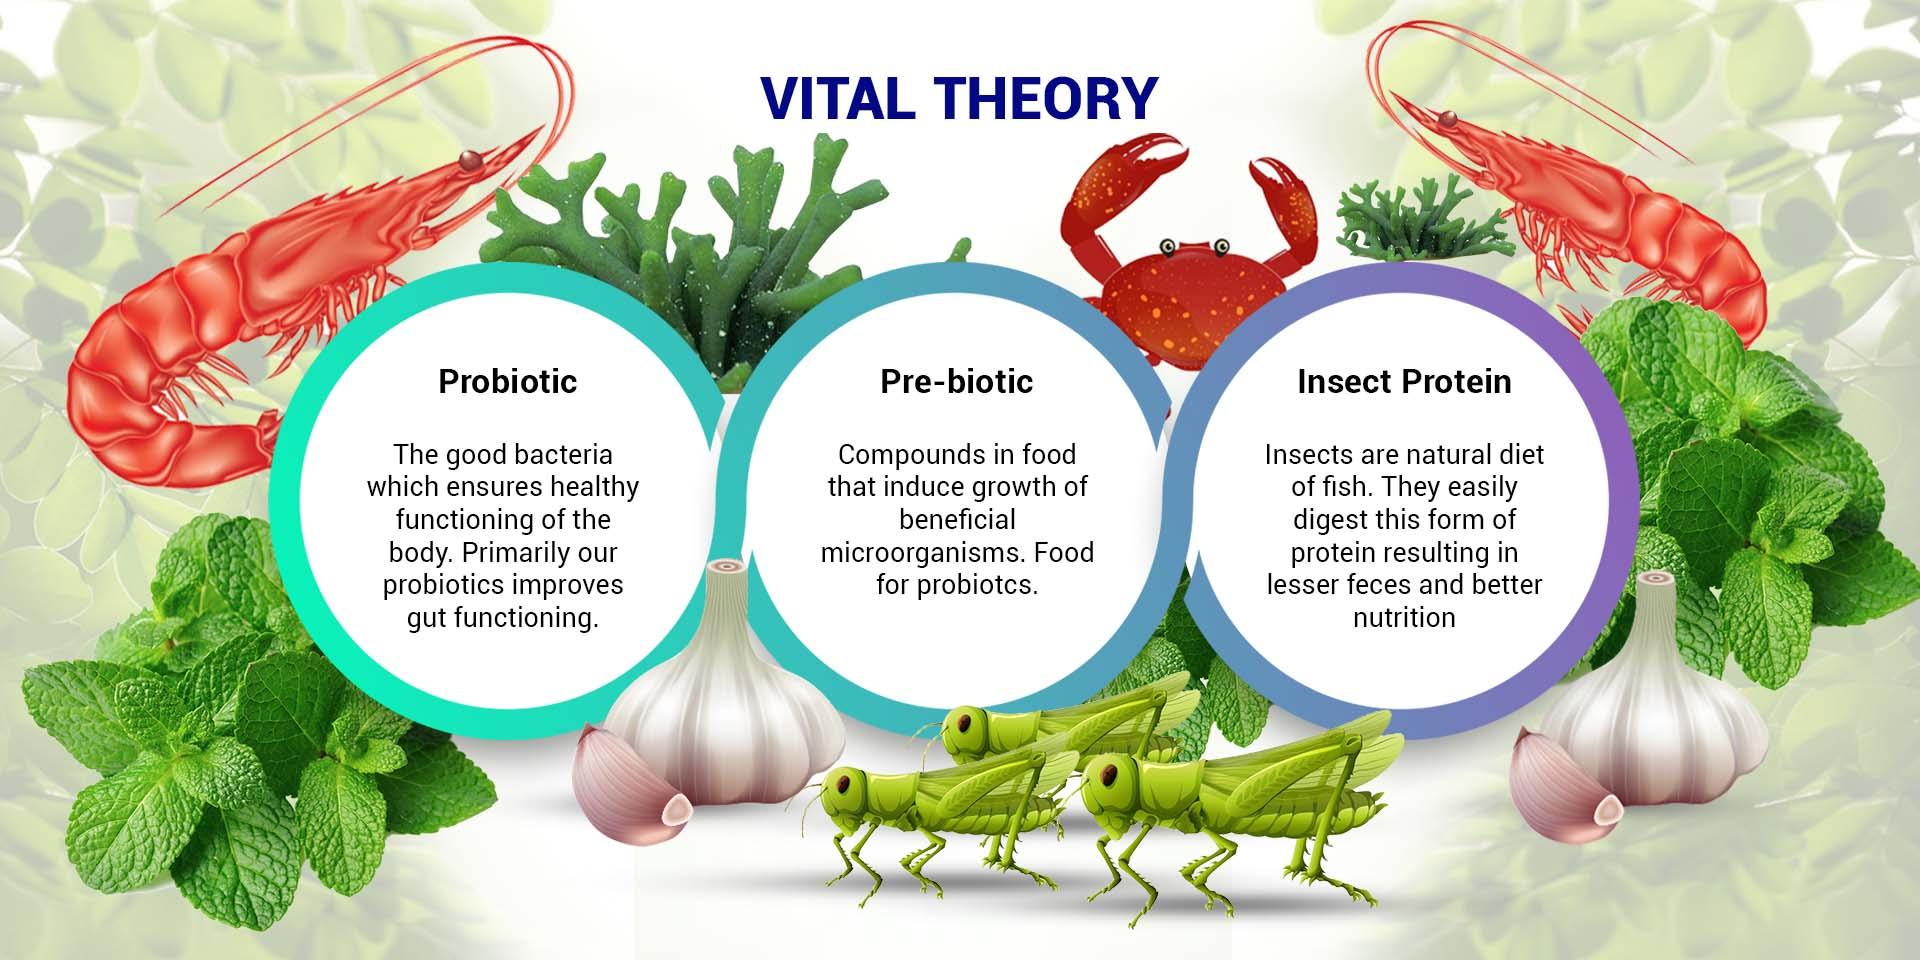 Biotics System1